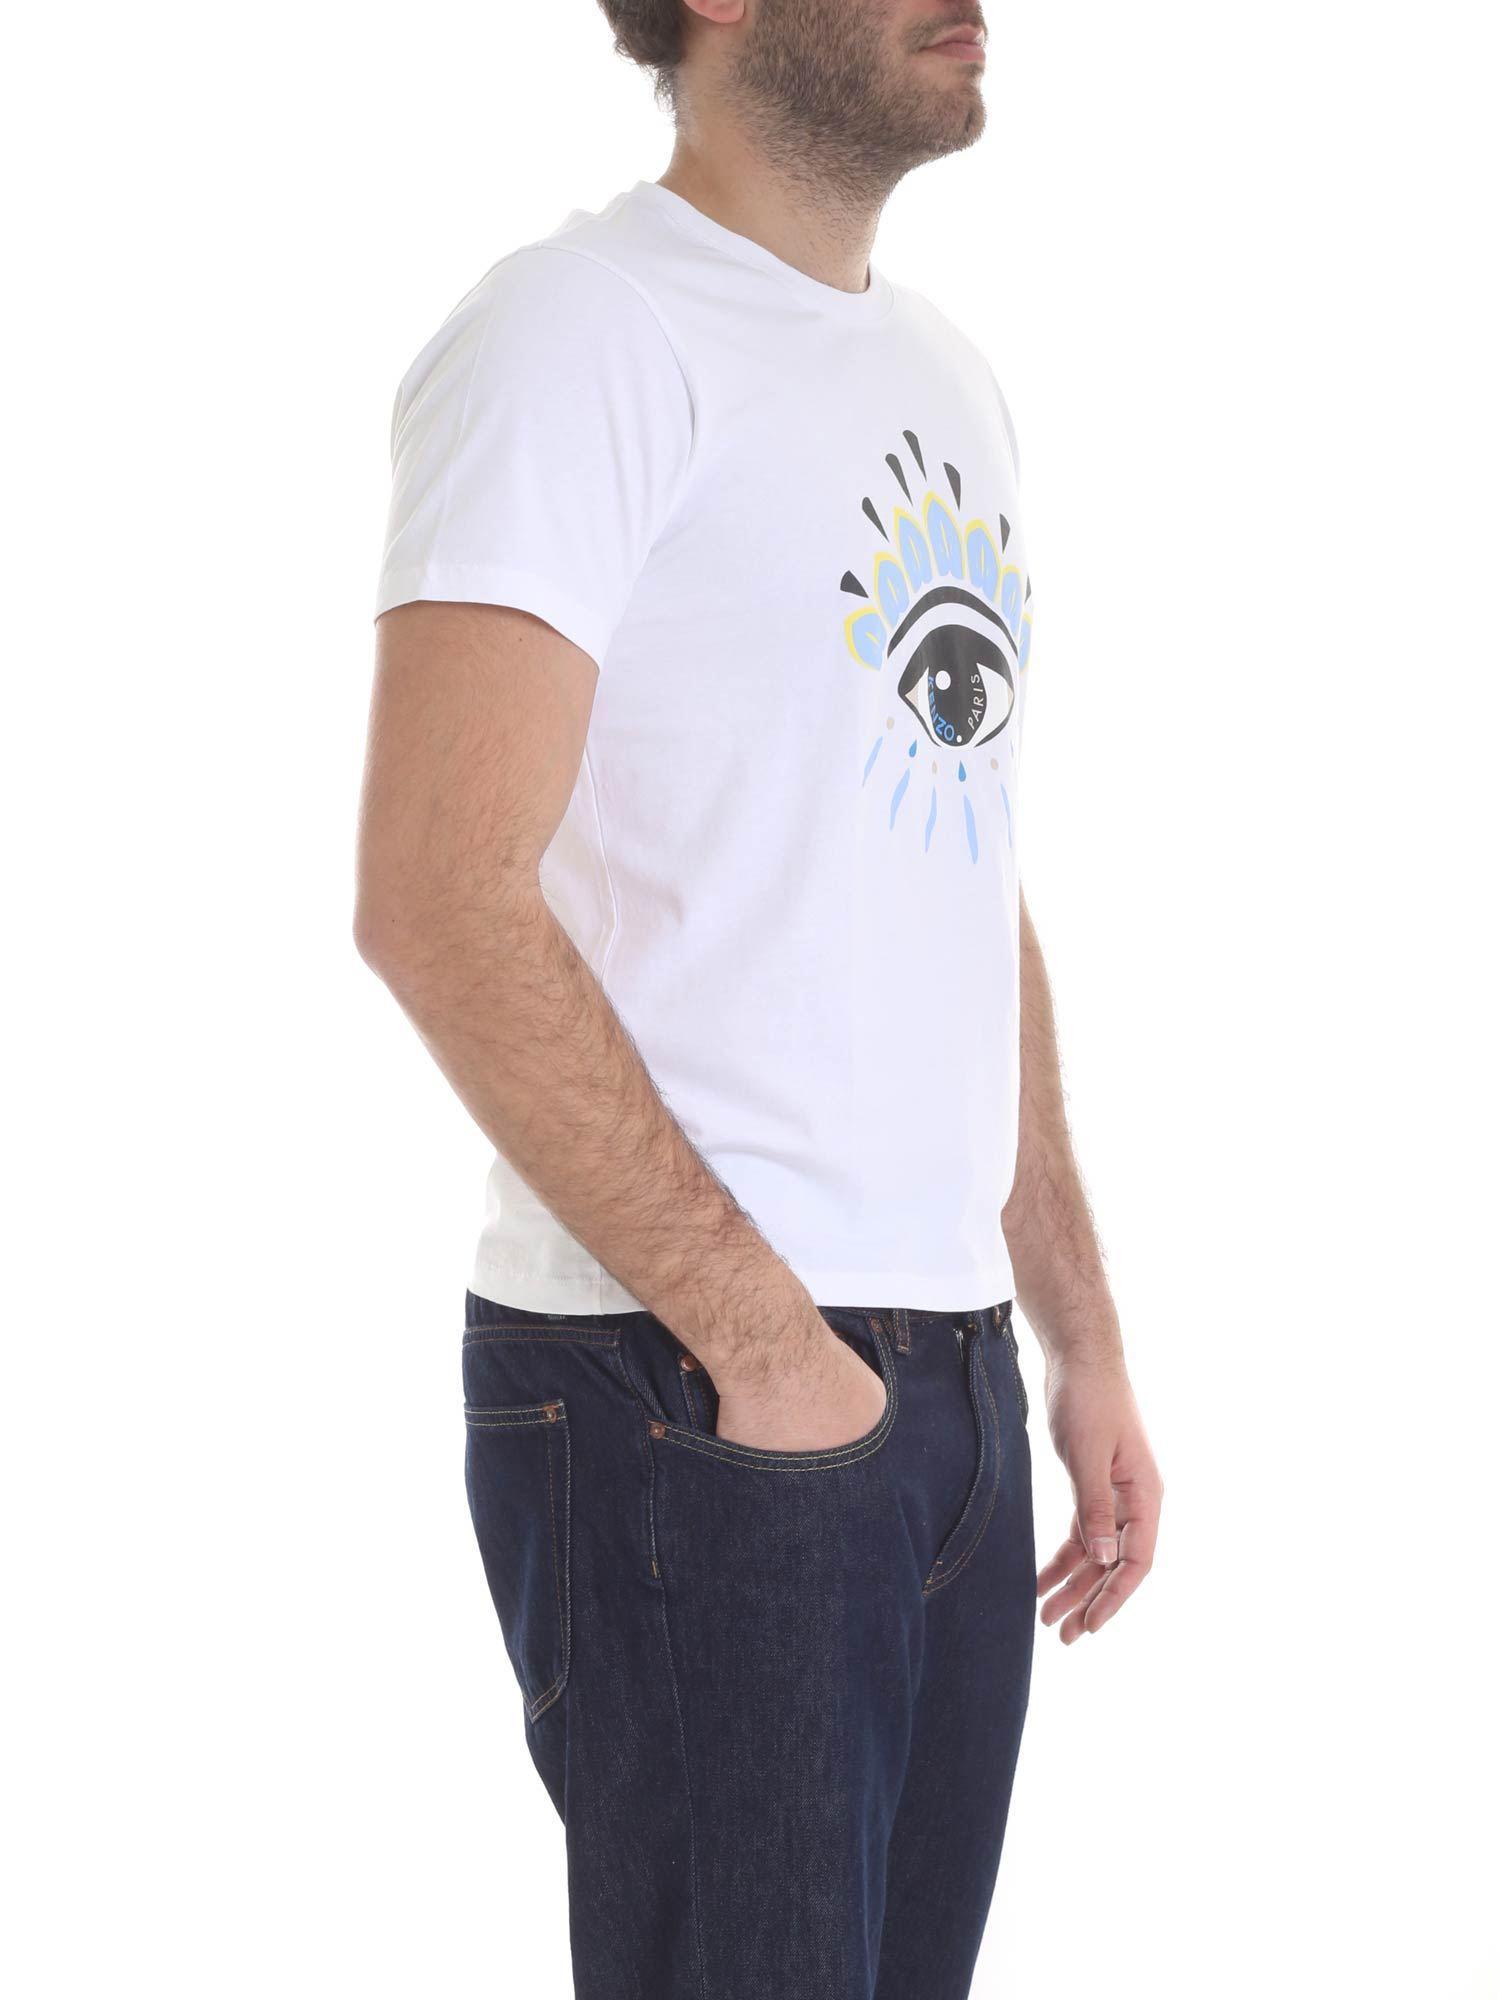 cc8f6f8cf16 KENZO White Eye Icon T-shirt in White for Men - Save 39% - Lyst